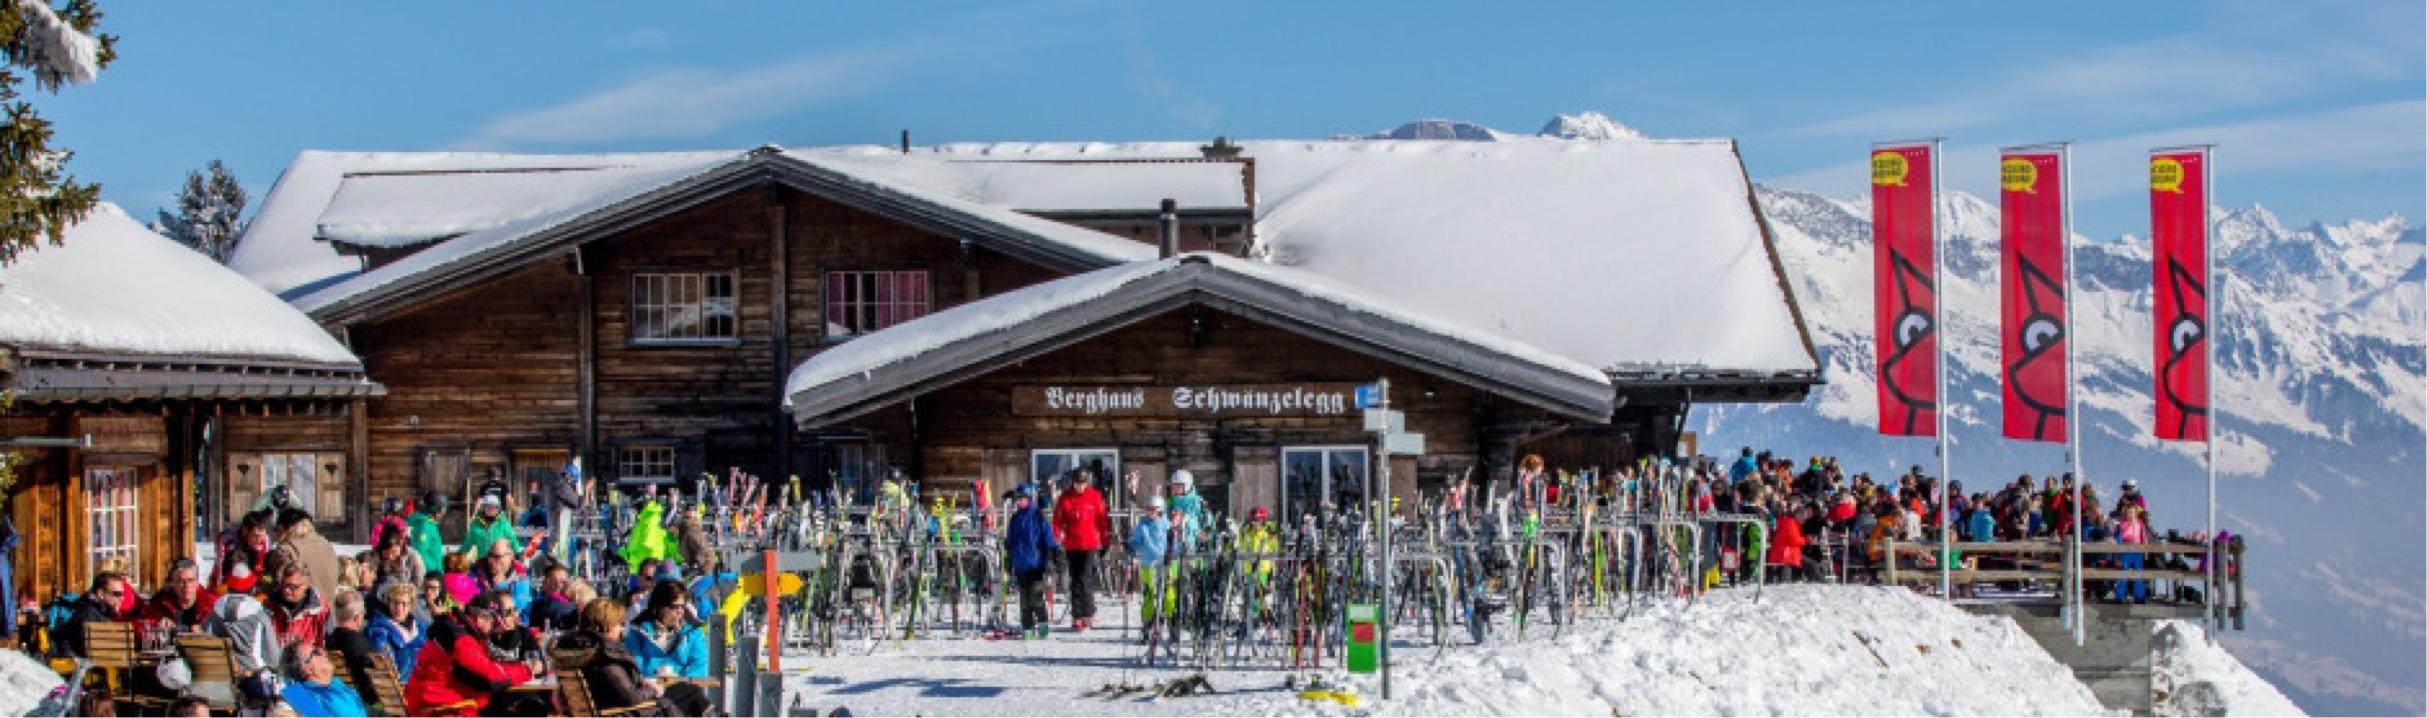 Skigebiet Grüsch - Danusa